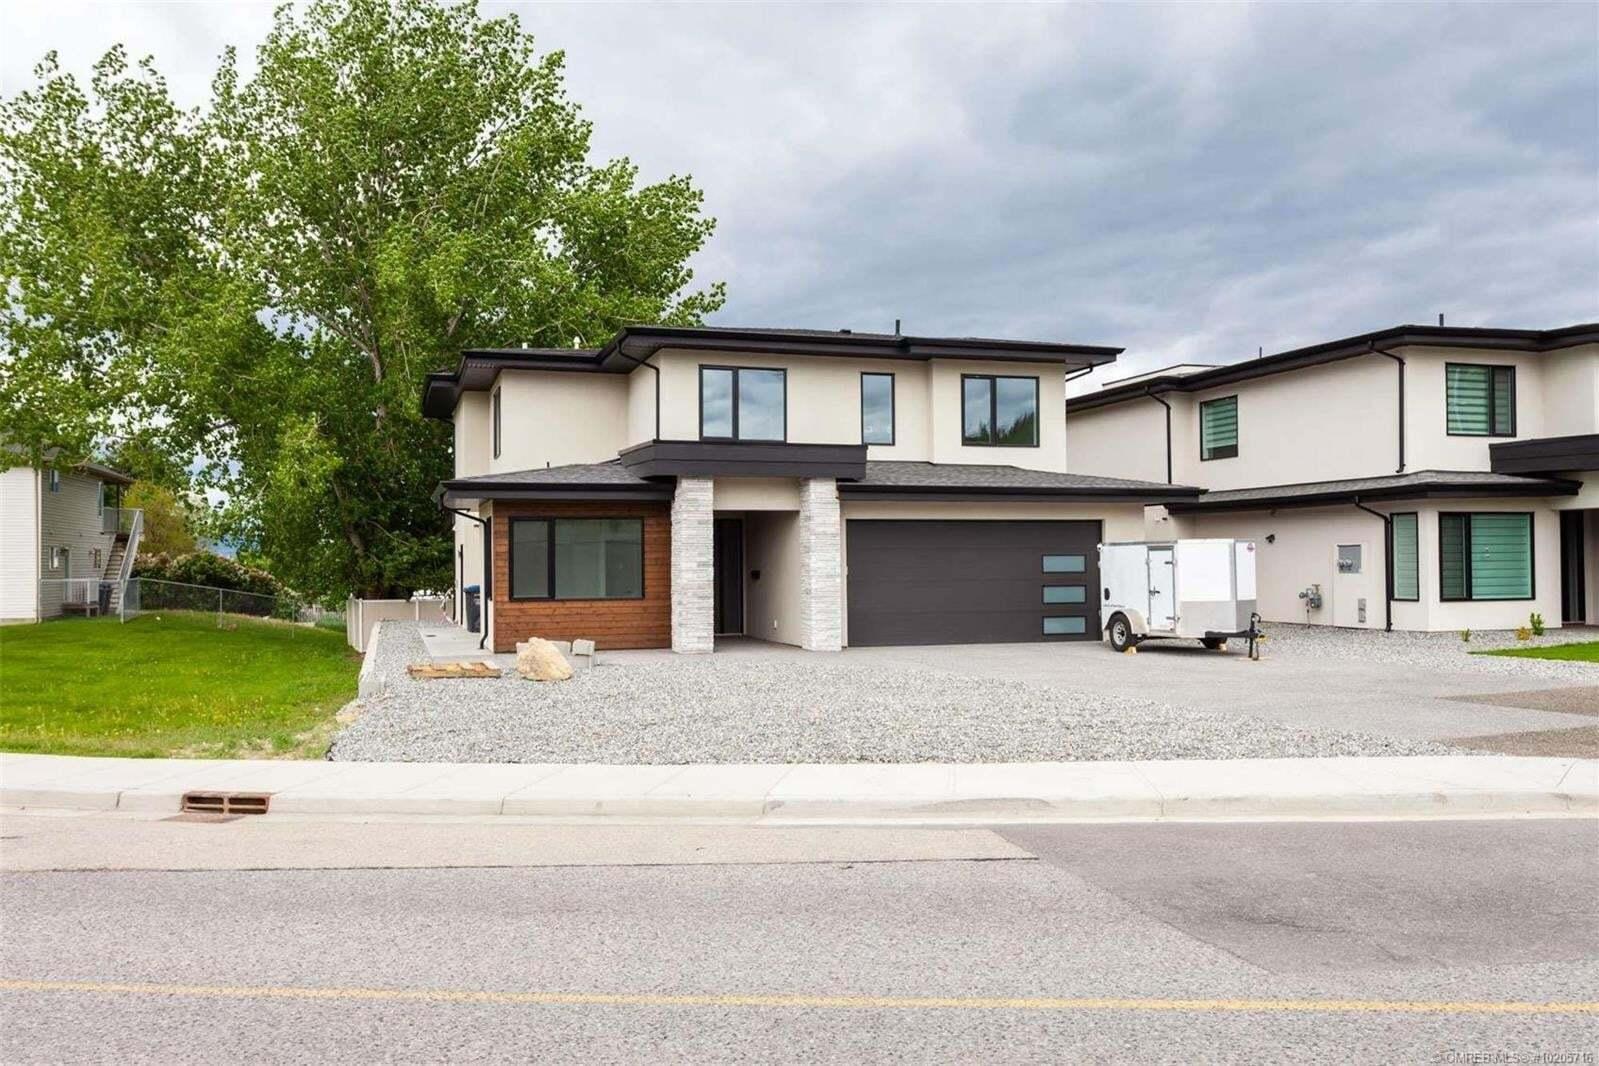 House for sale at 570 Mckenzie Rd Kelowna British Columbia - MLS: 10205716